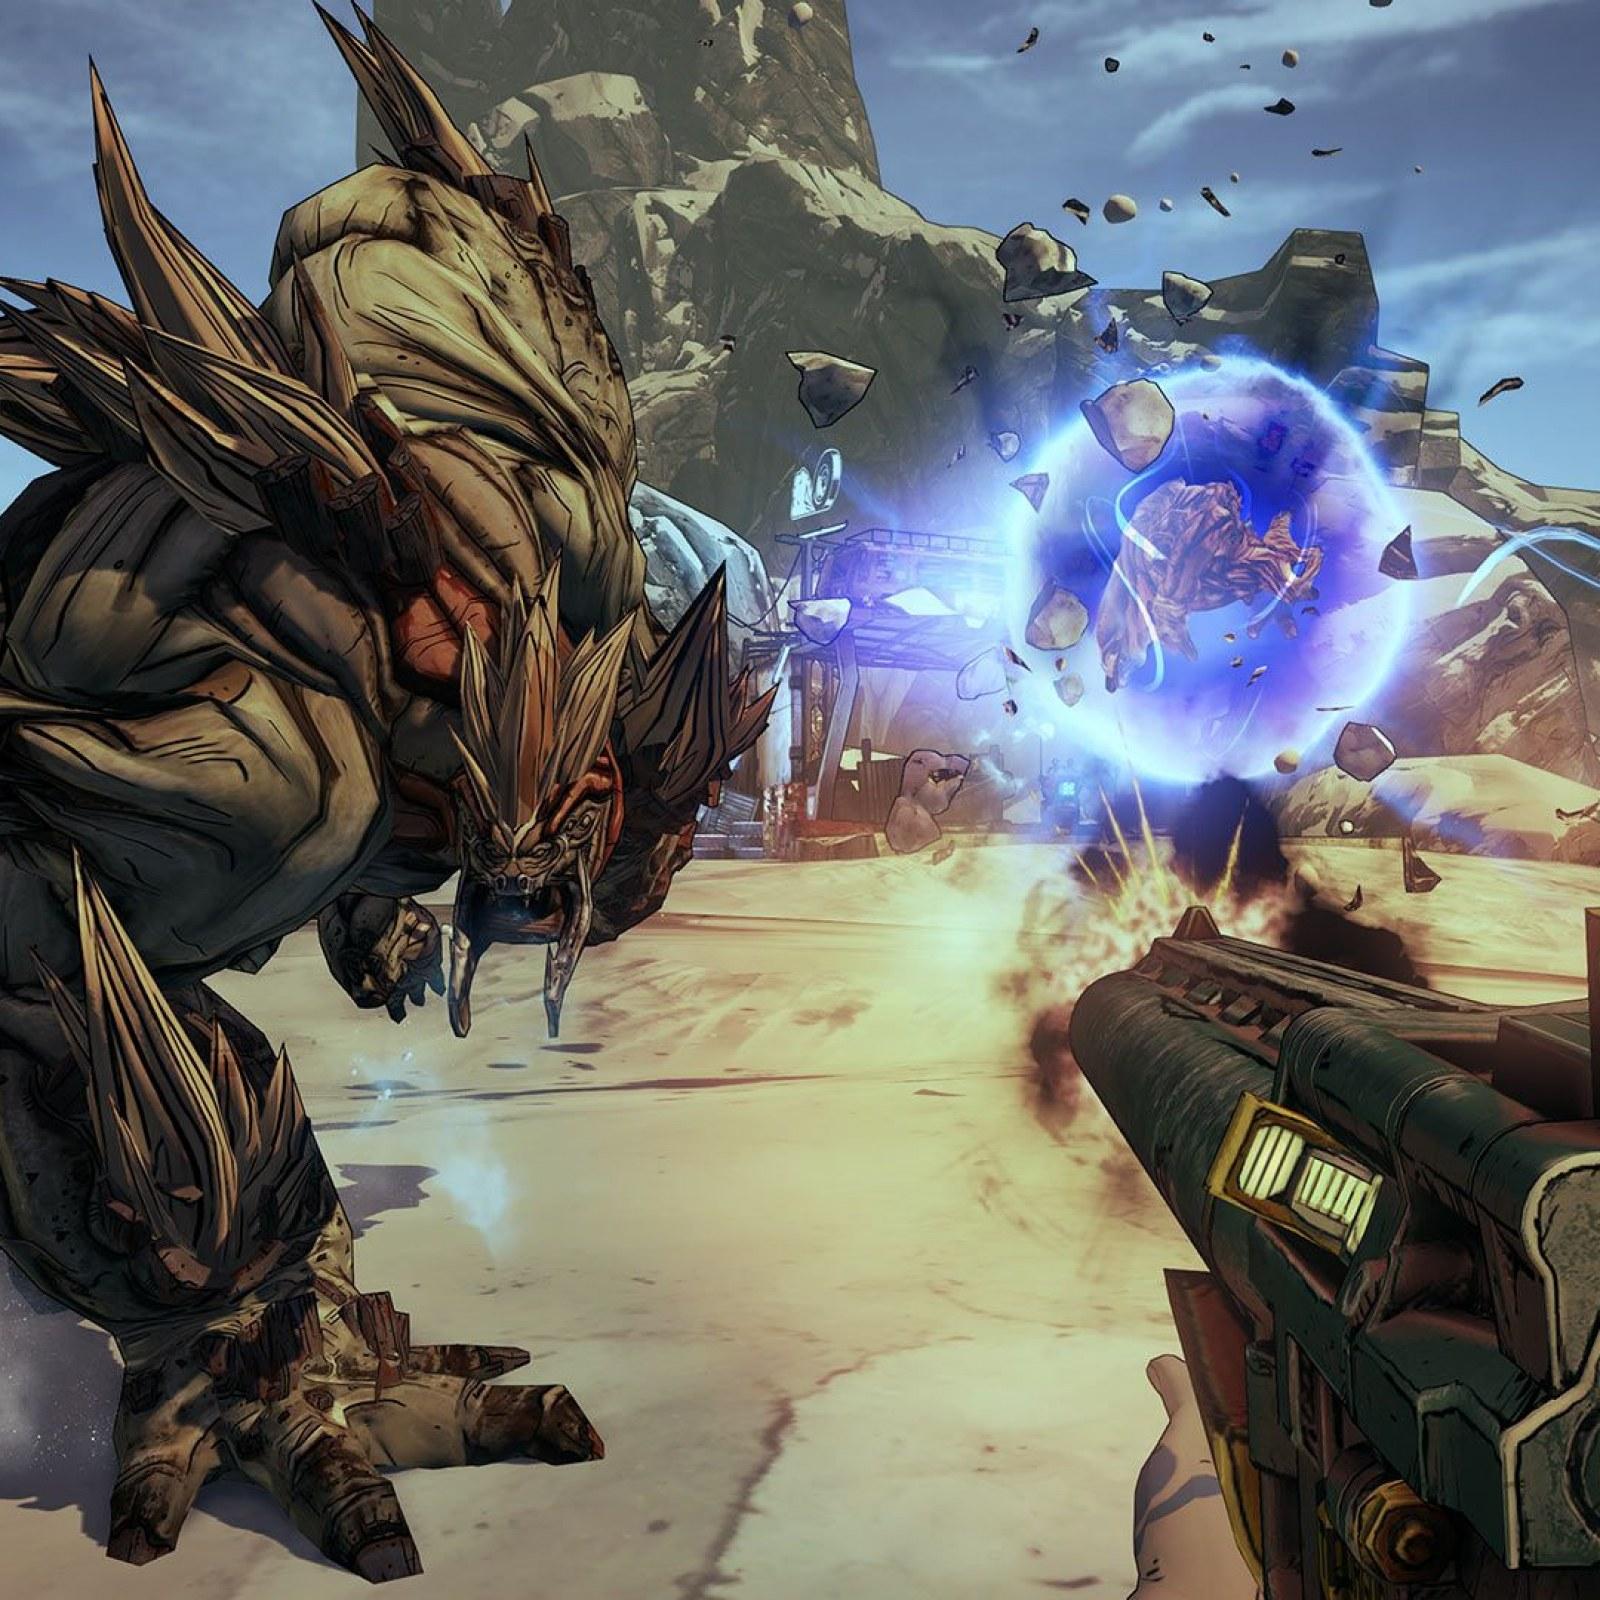 Borderlands 3' Gameplay Reveal Recap - Weapons, Skills